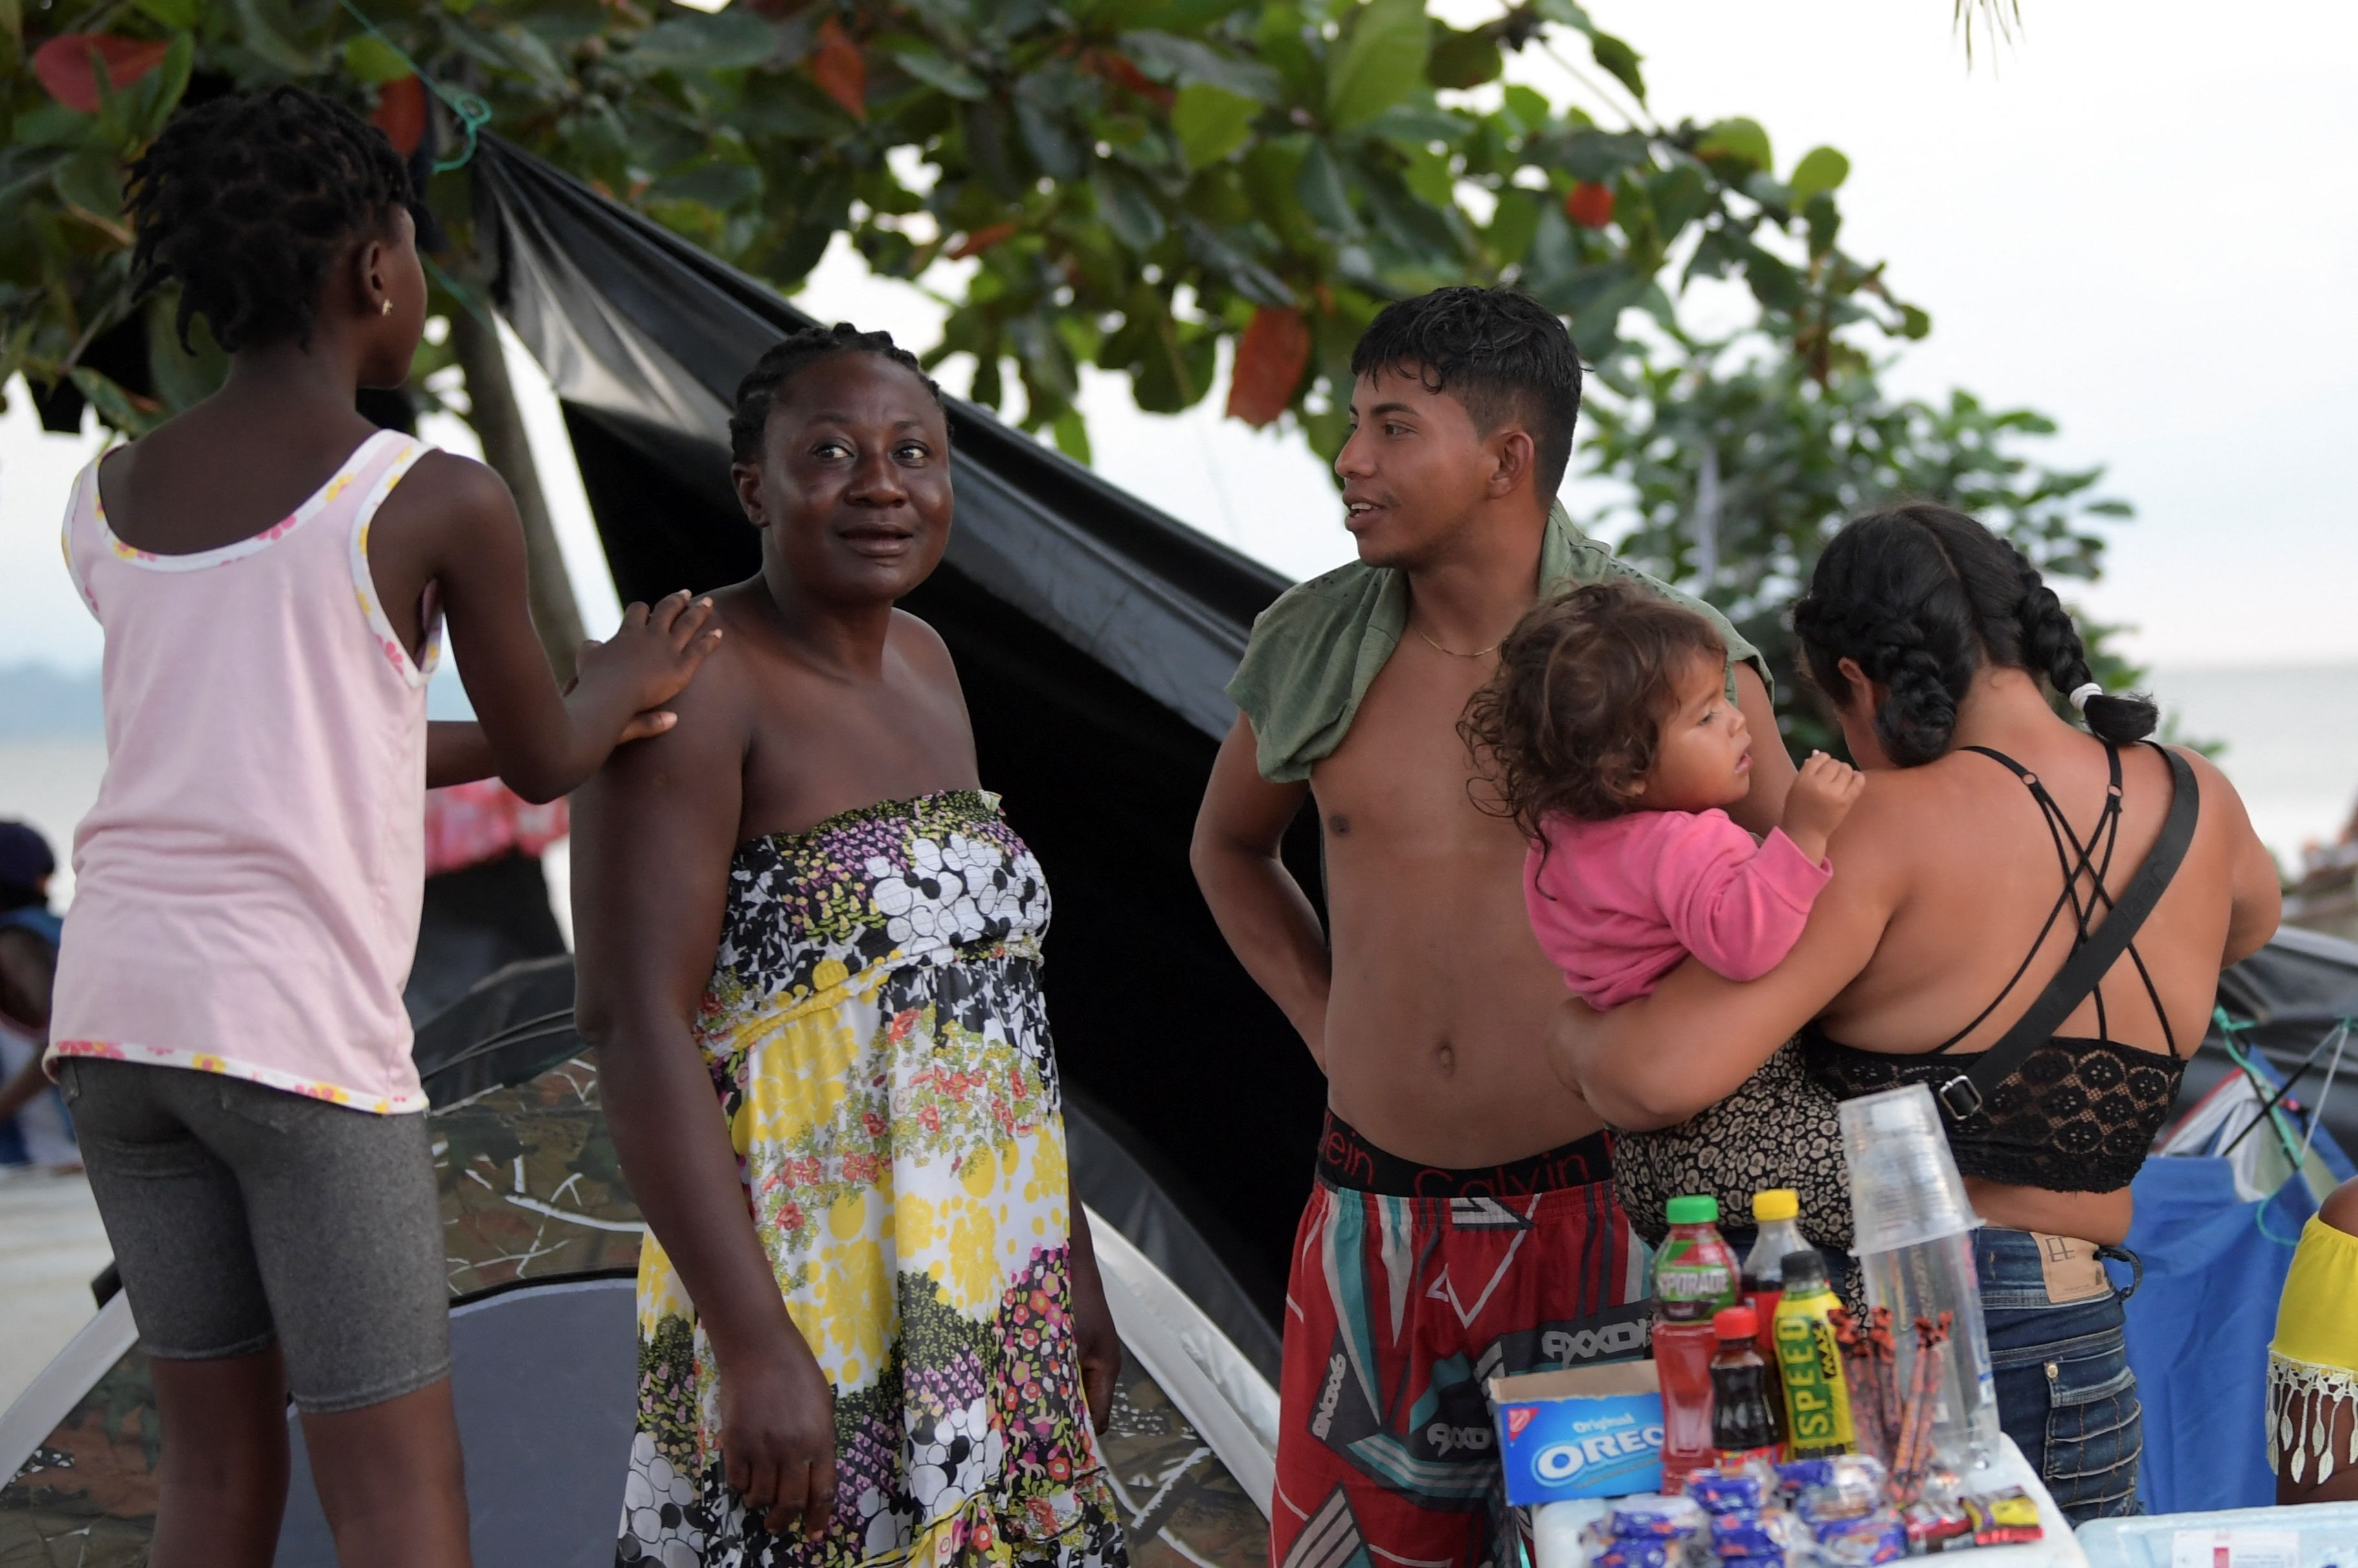 Haitianos ayudan a venezolanos en ruta a EEUU